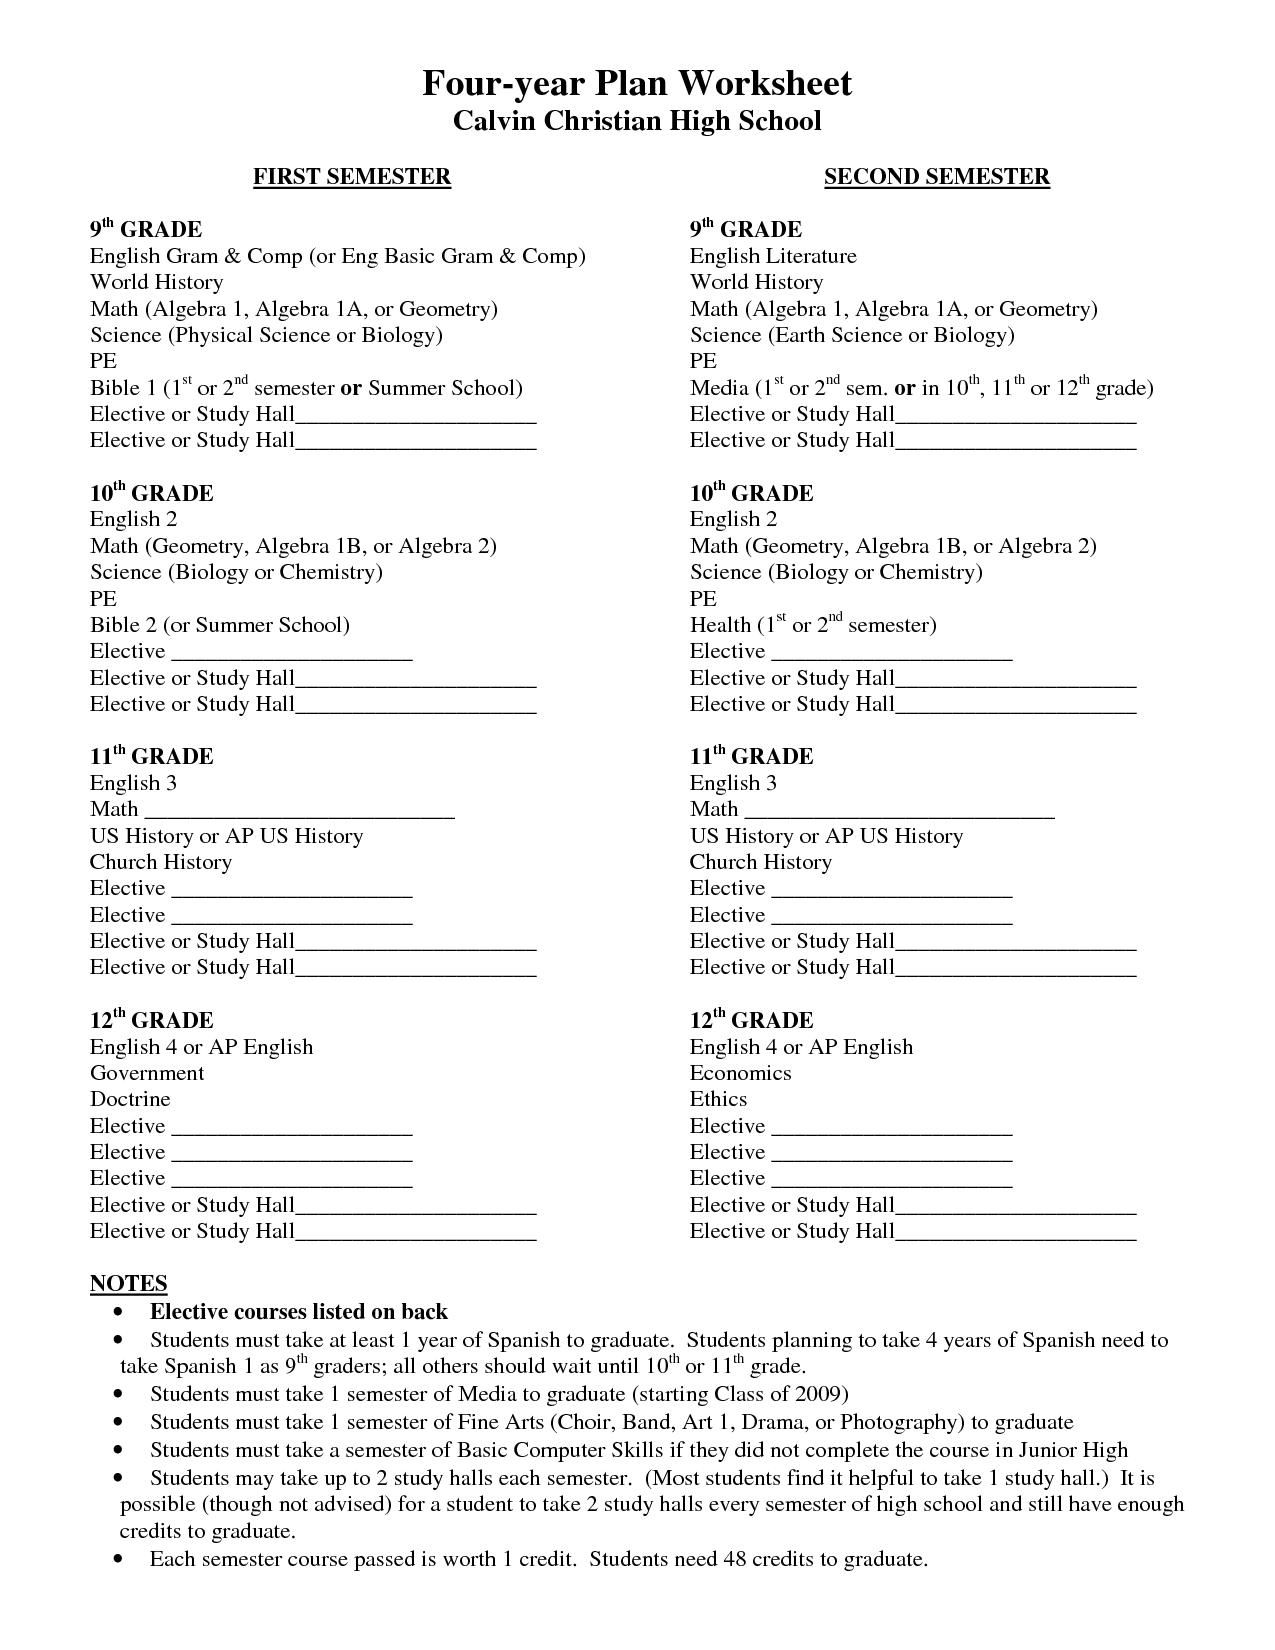 Creative Math Worksheets For High School